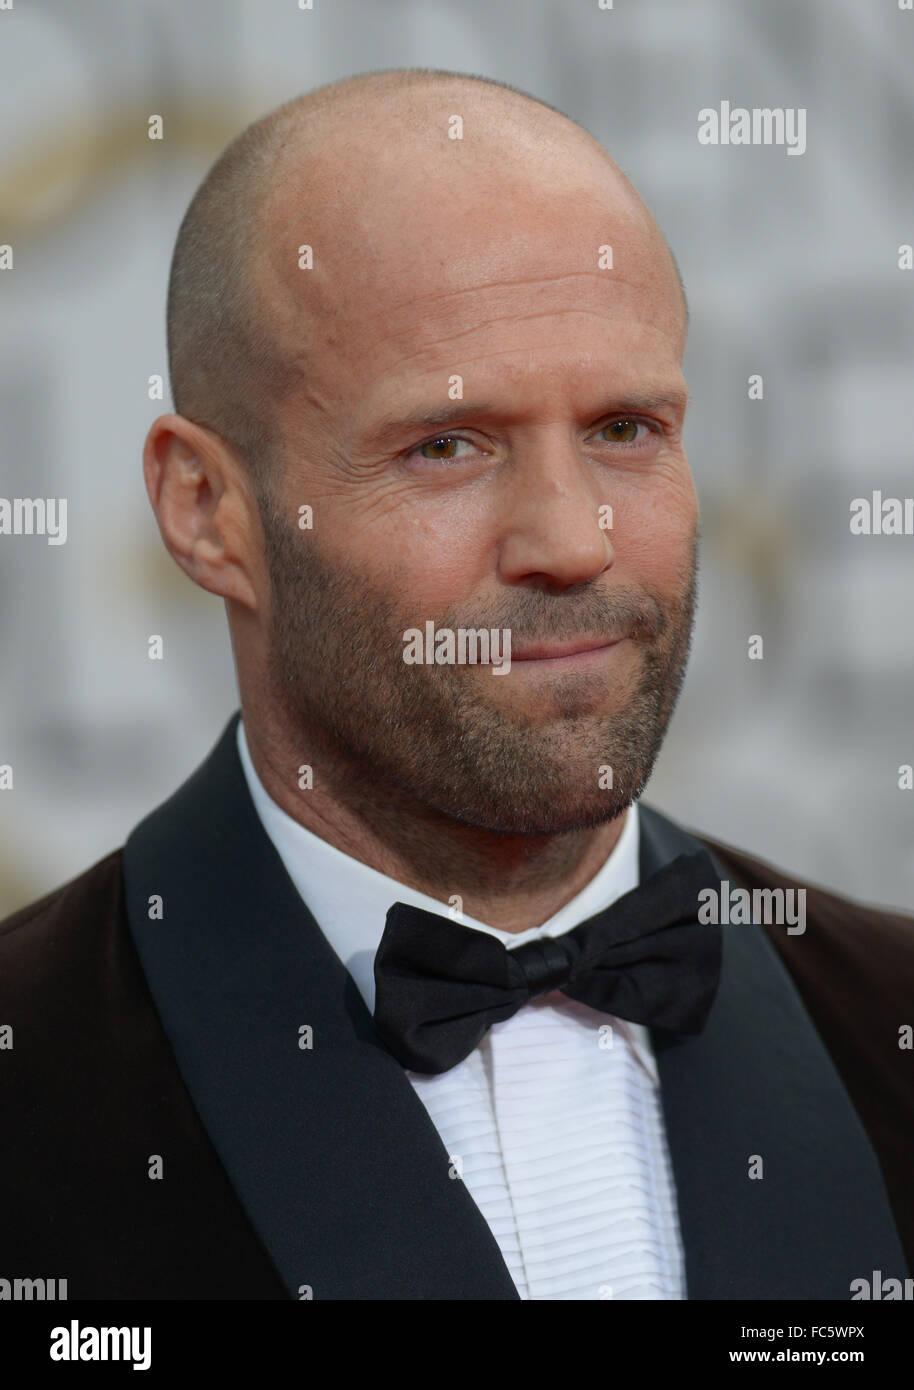 Jason Statham arrives at the Golden Globe awards. Stock Photo